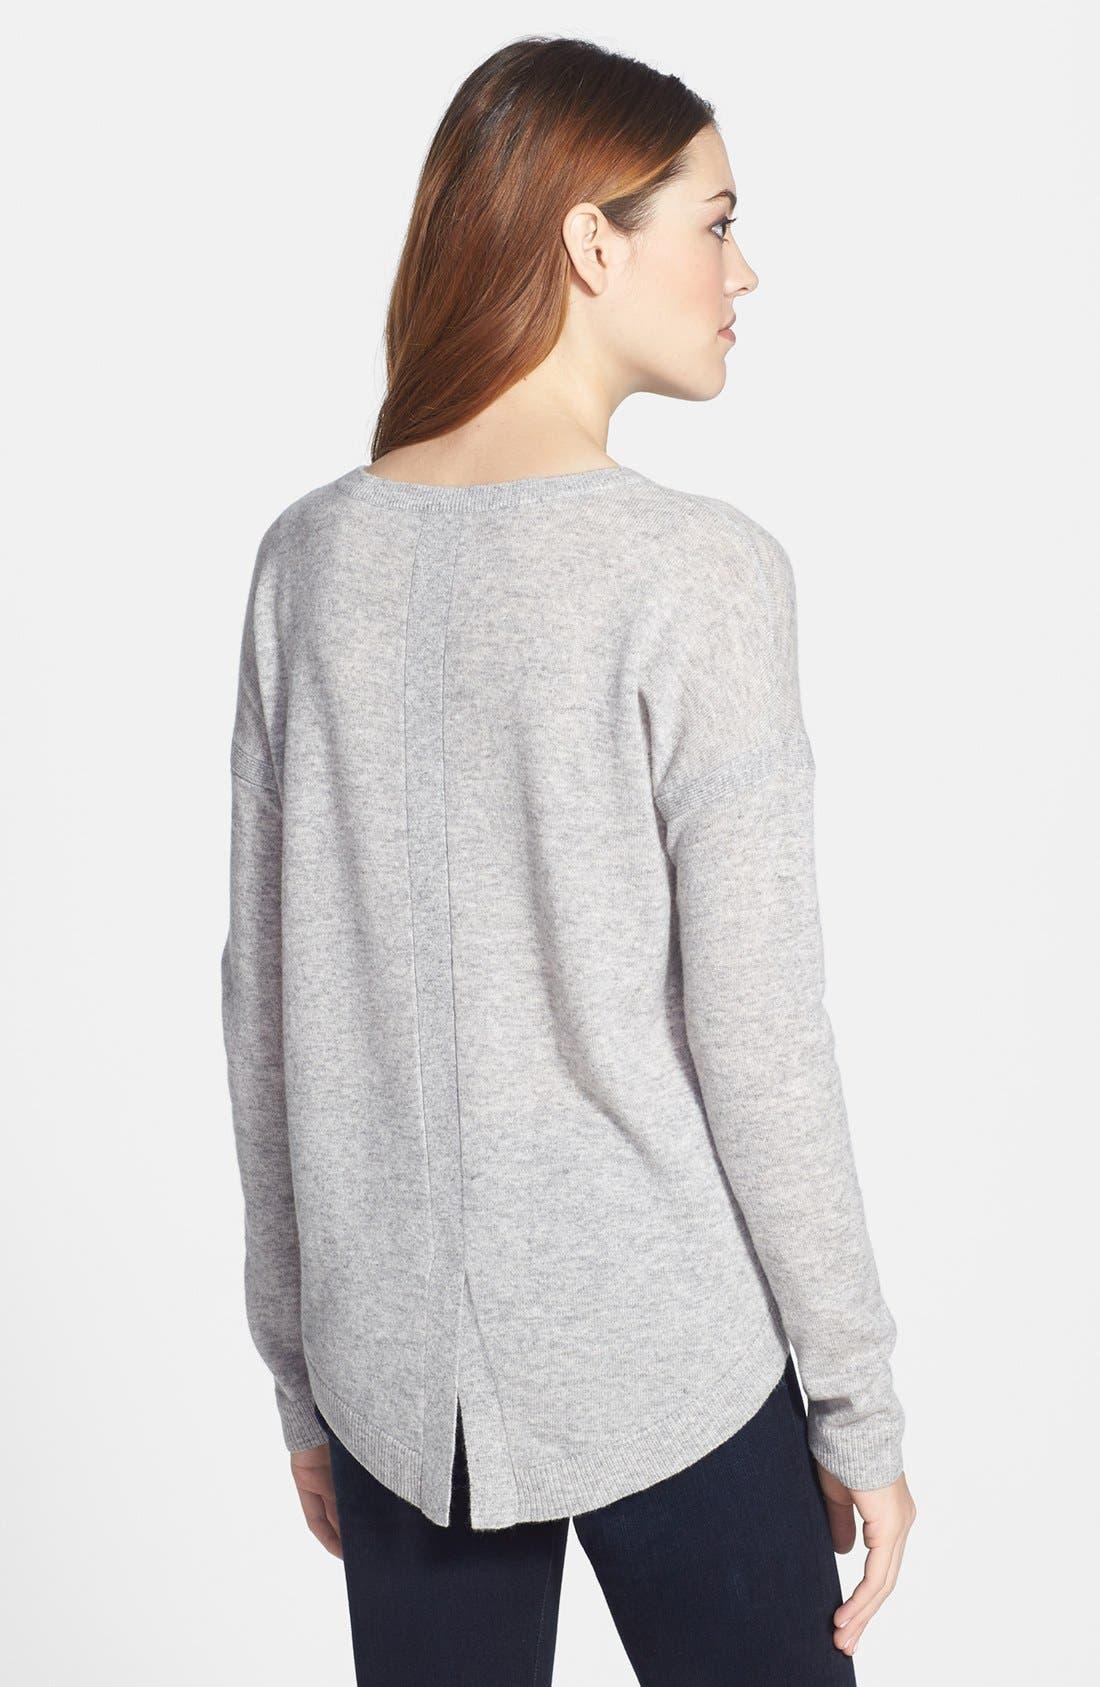 Alternate Image 2  - Halogen® Lightweight Cashmere Crewneck Sweater with Pocket (Petite)